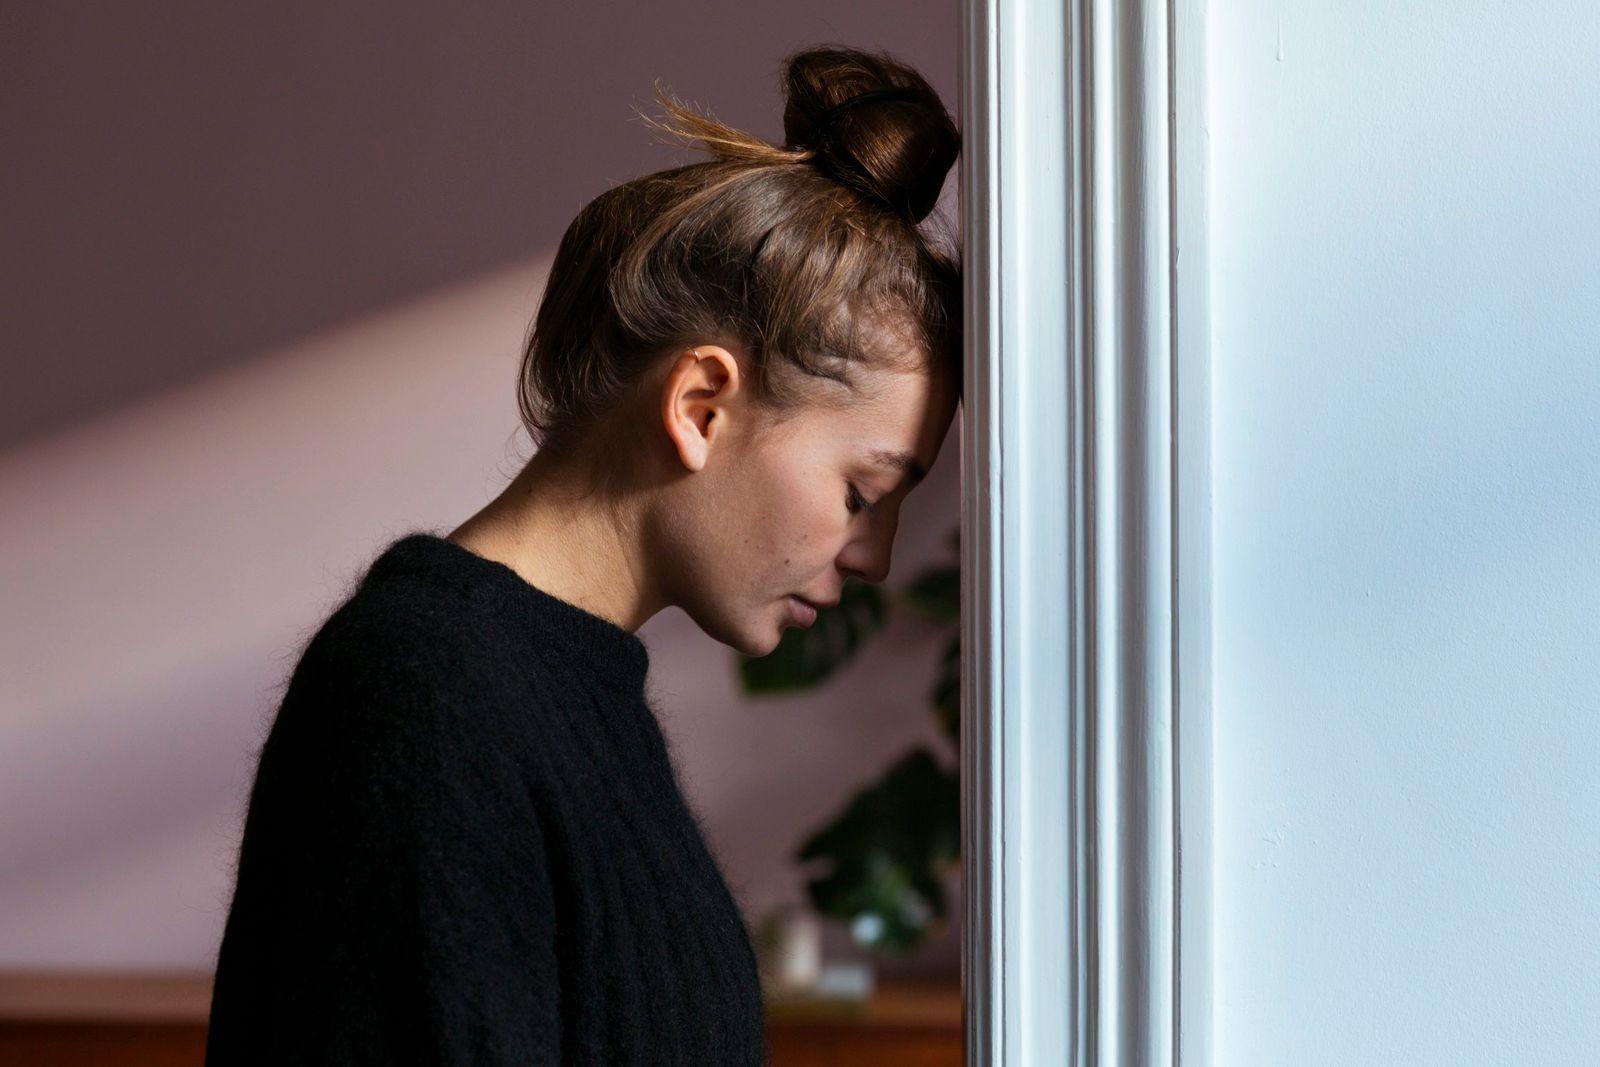 Junge Frau lehnt erschöpft am Türrahmen